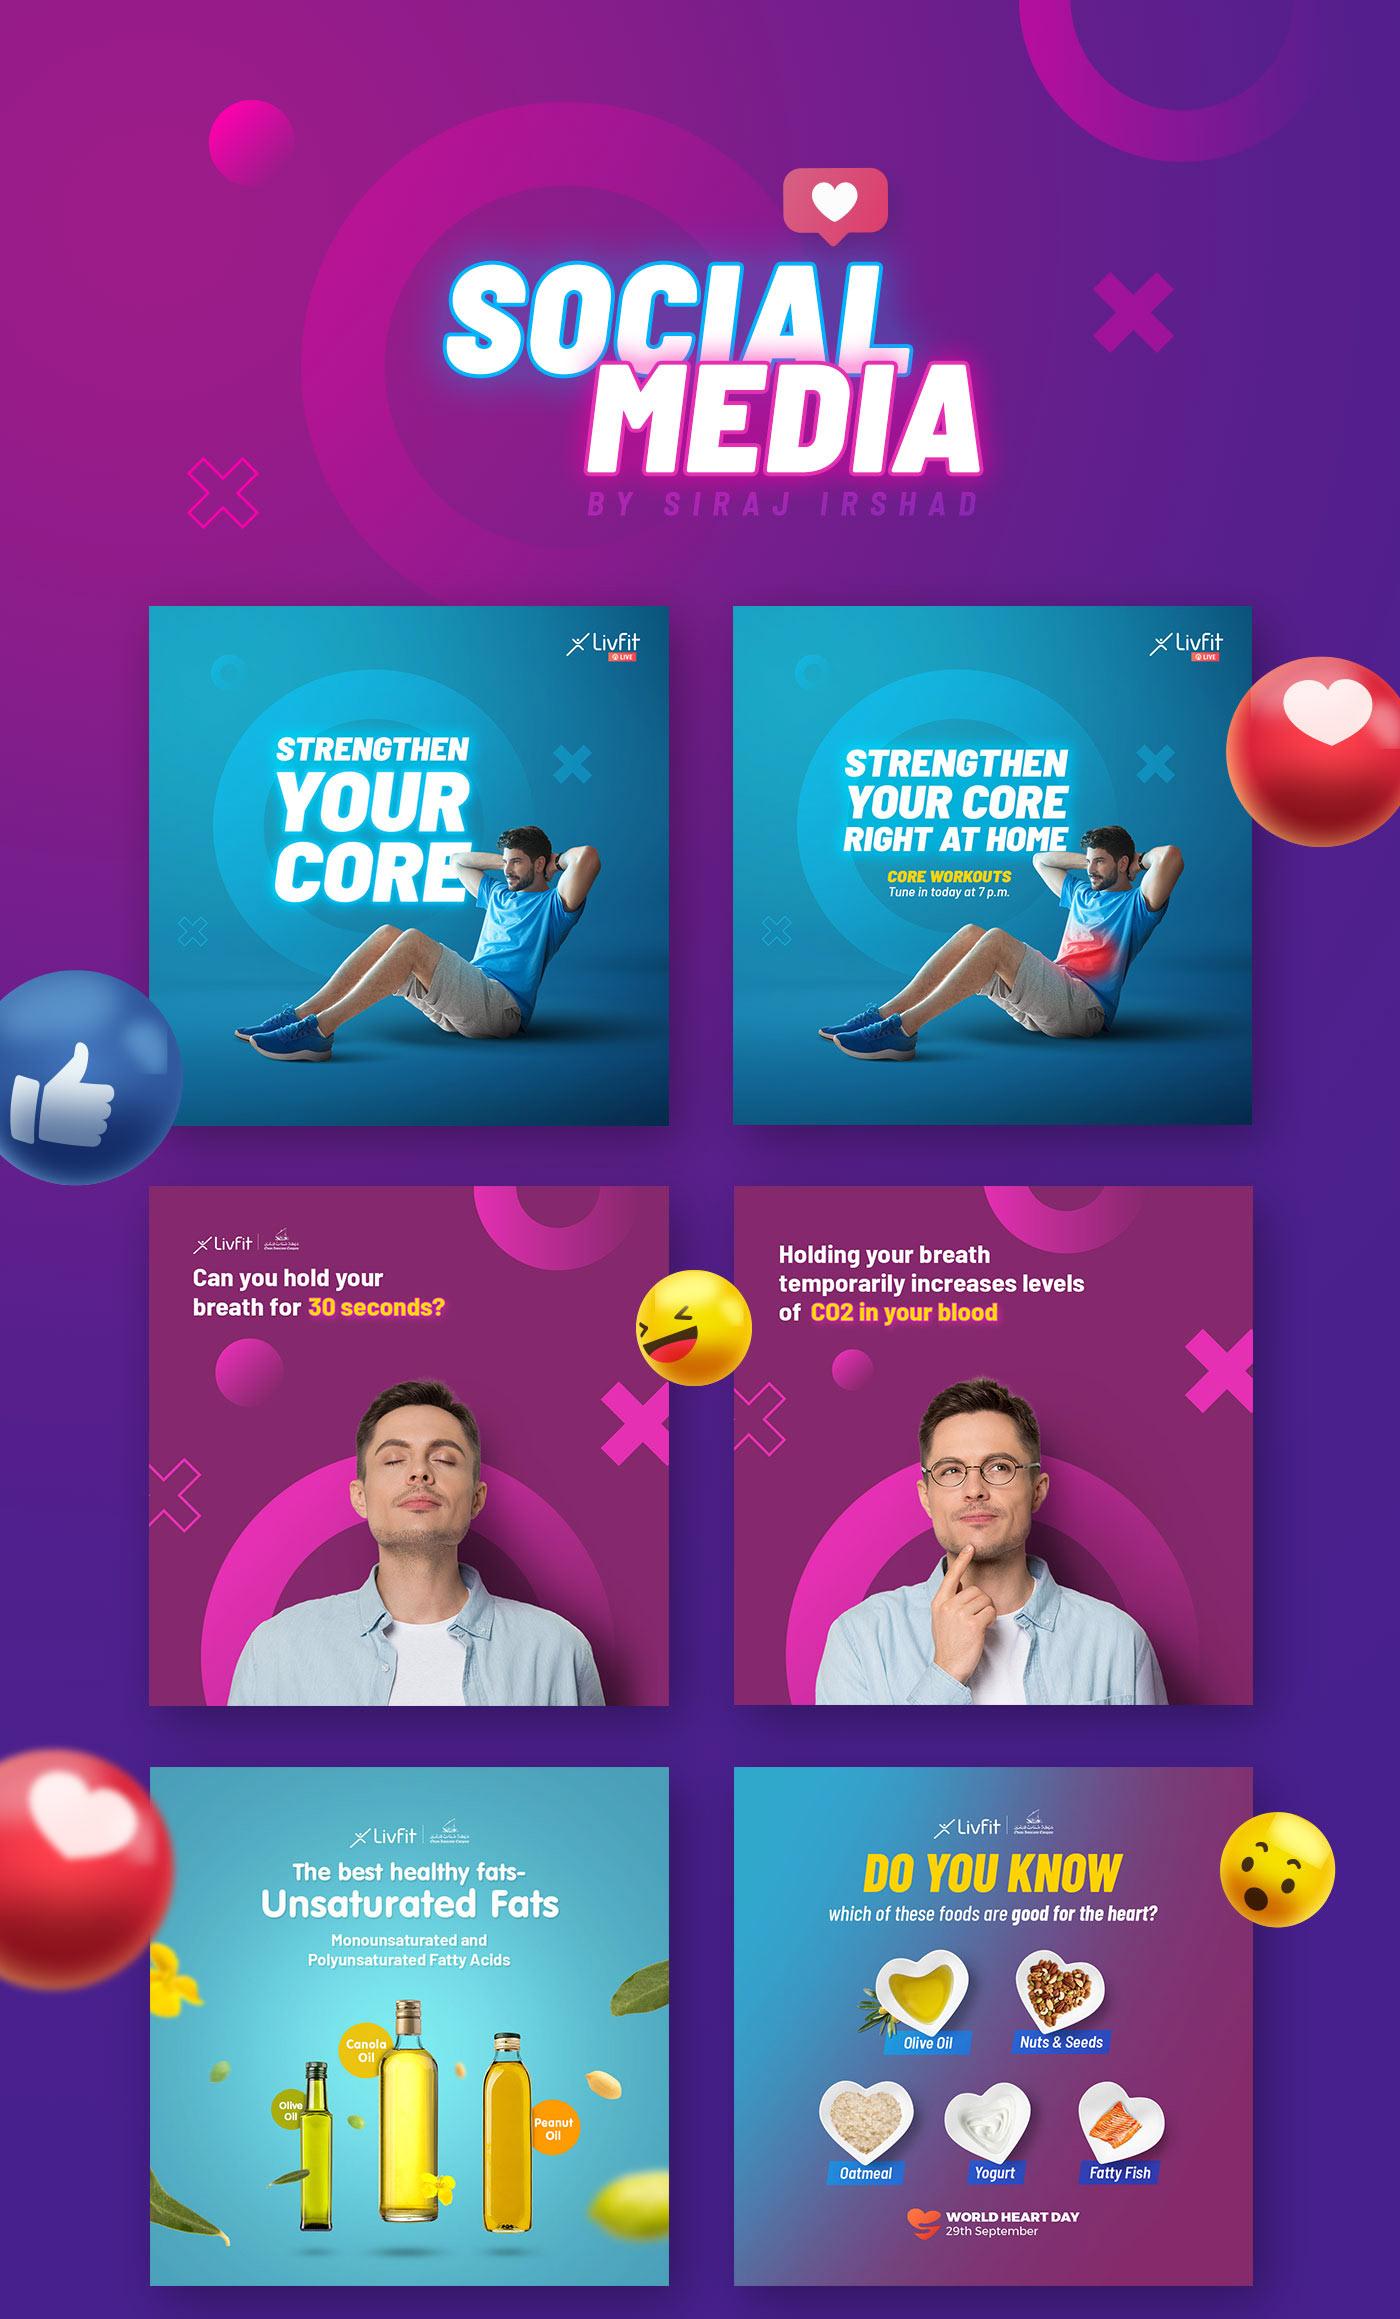 Social media creatives/ads/design for facebook and instagram